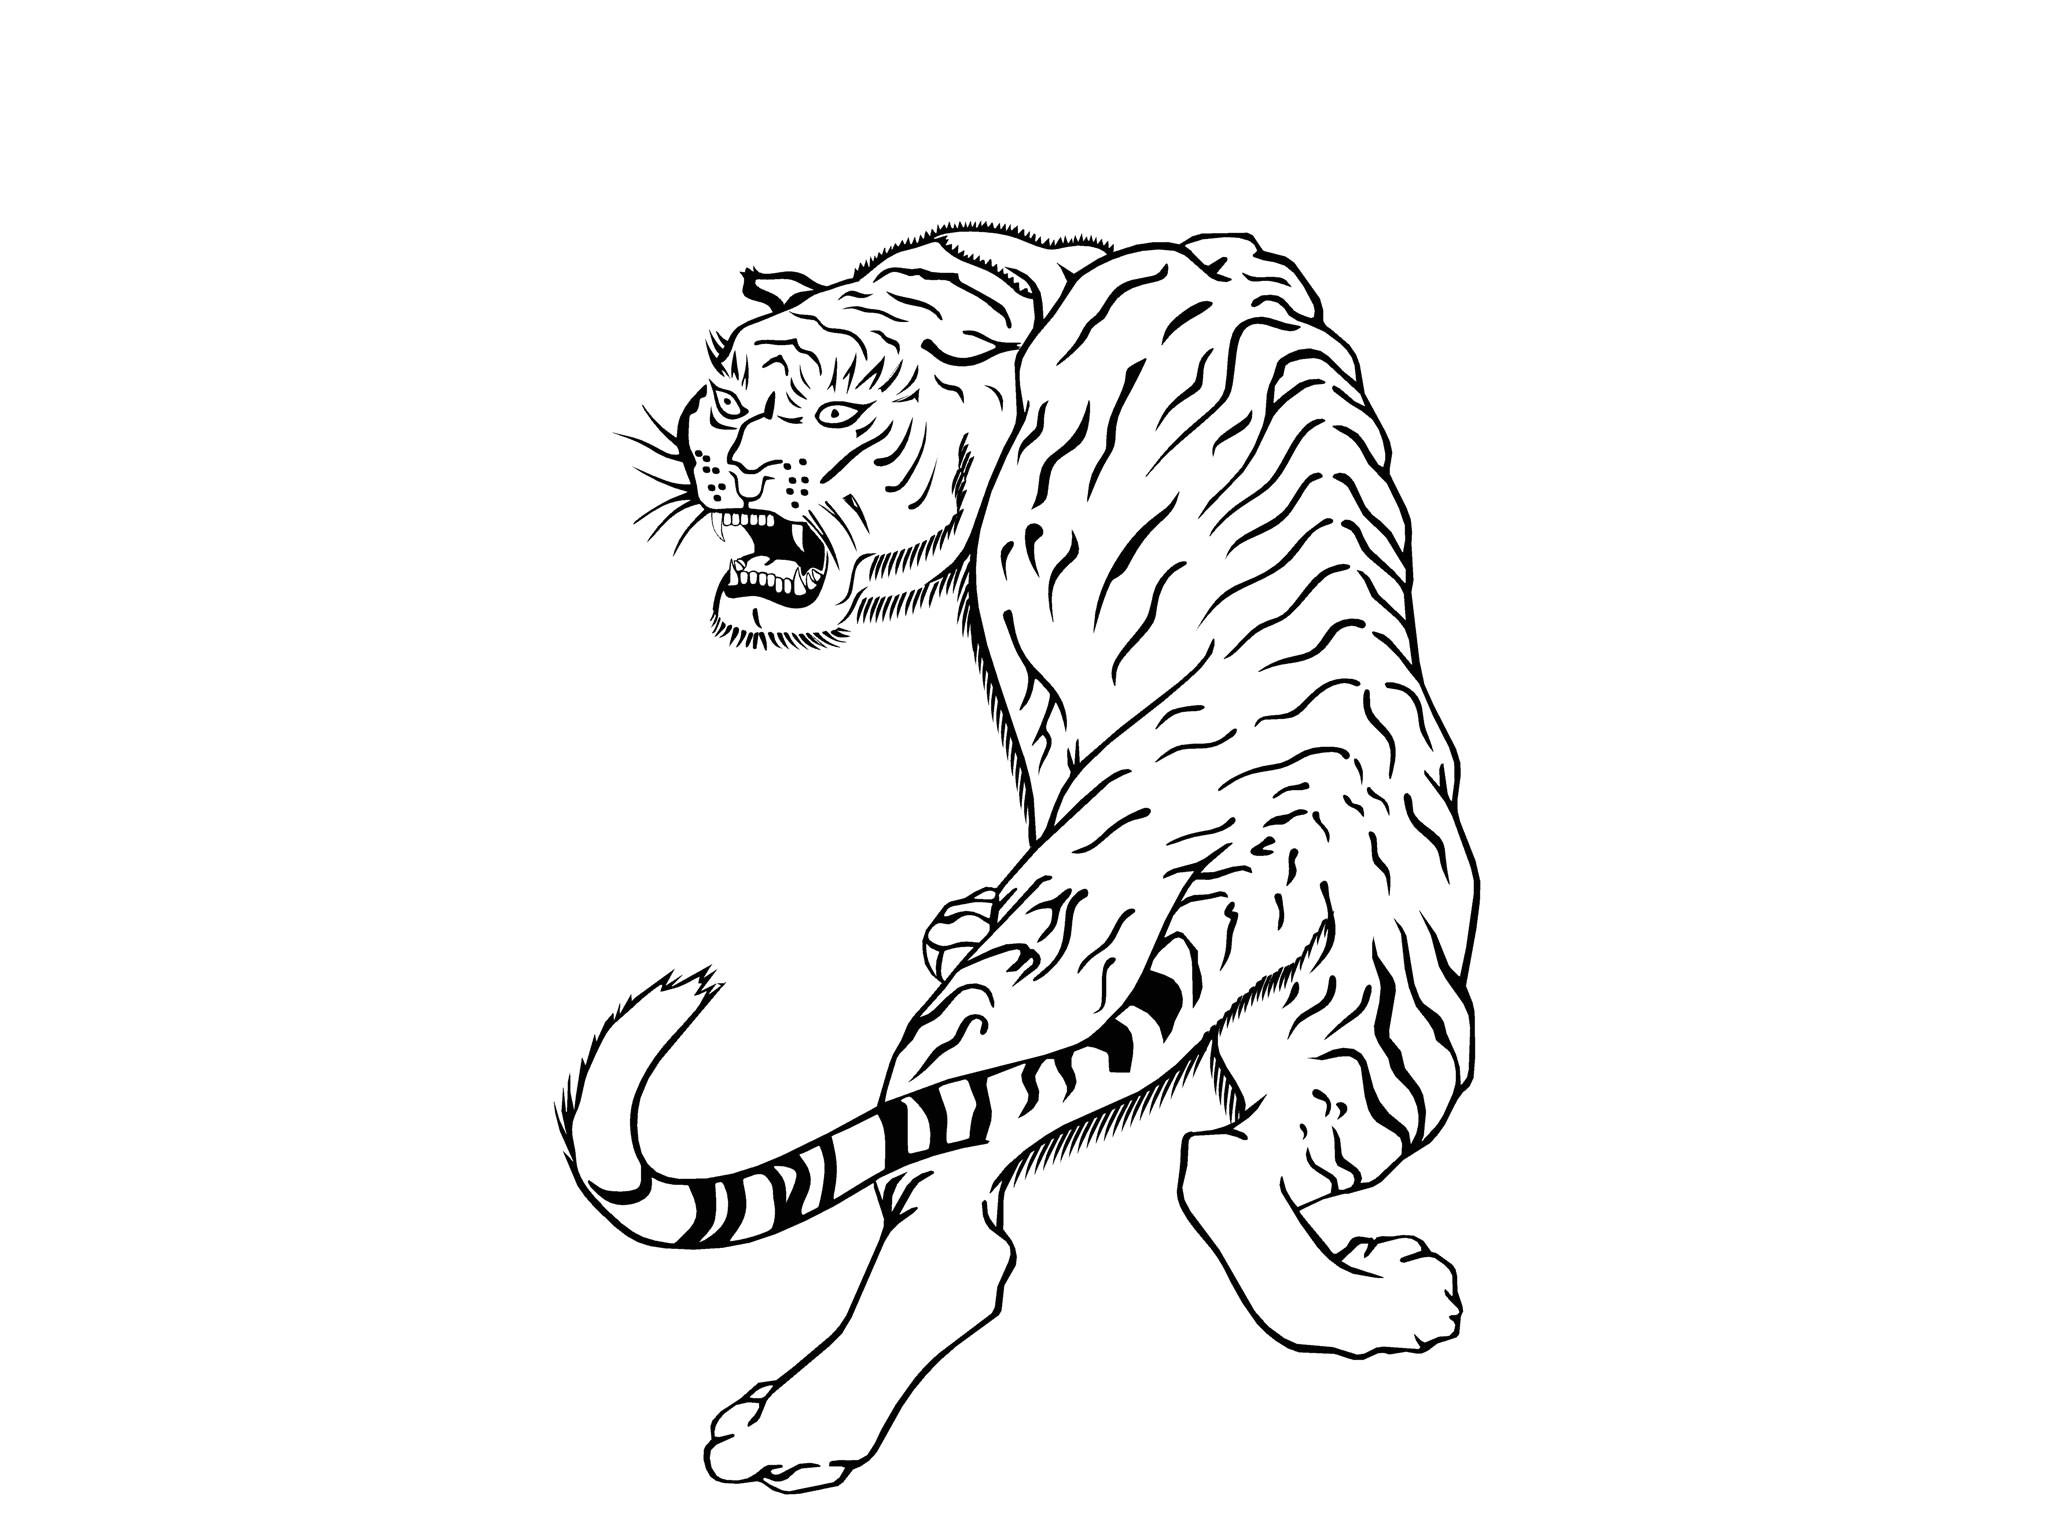 52819 plain outline tiger tattoo design